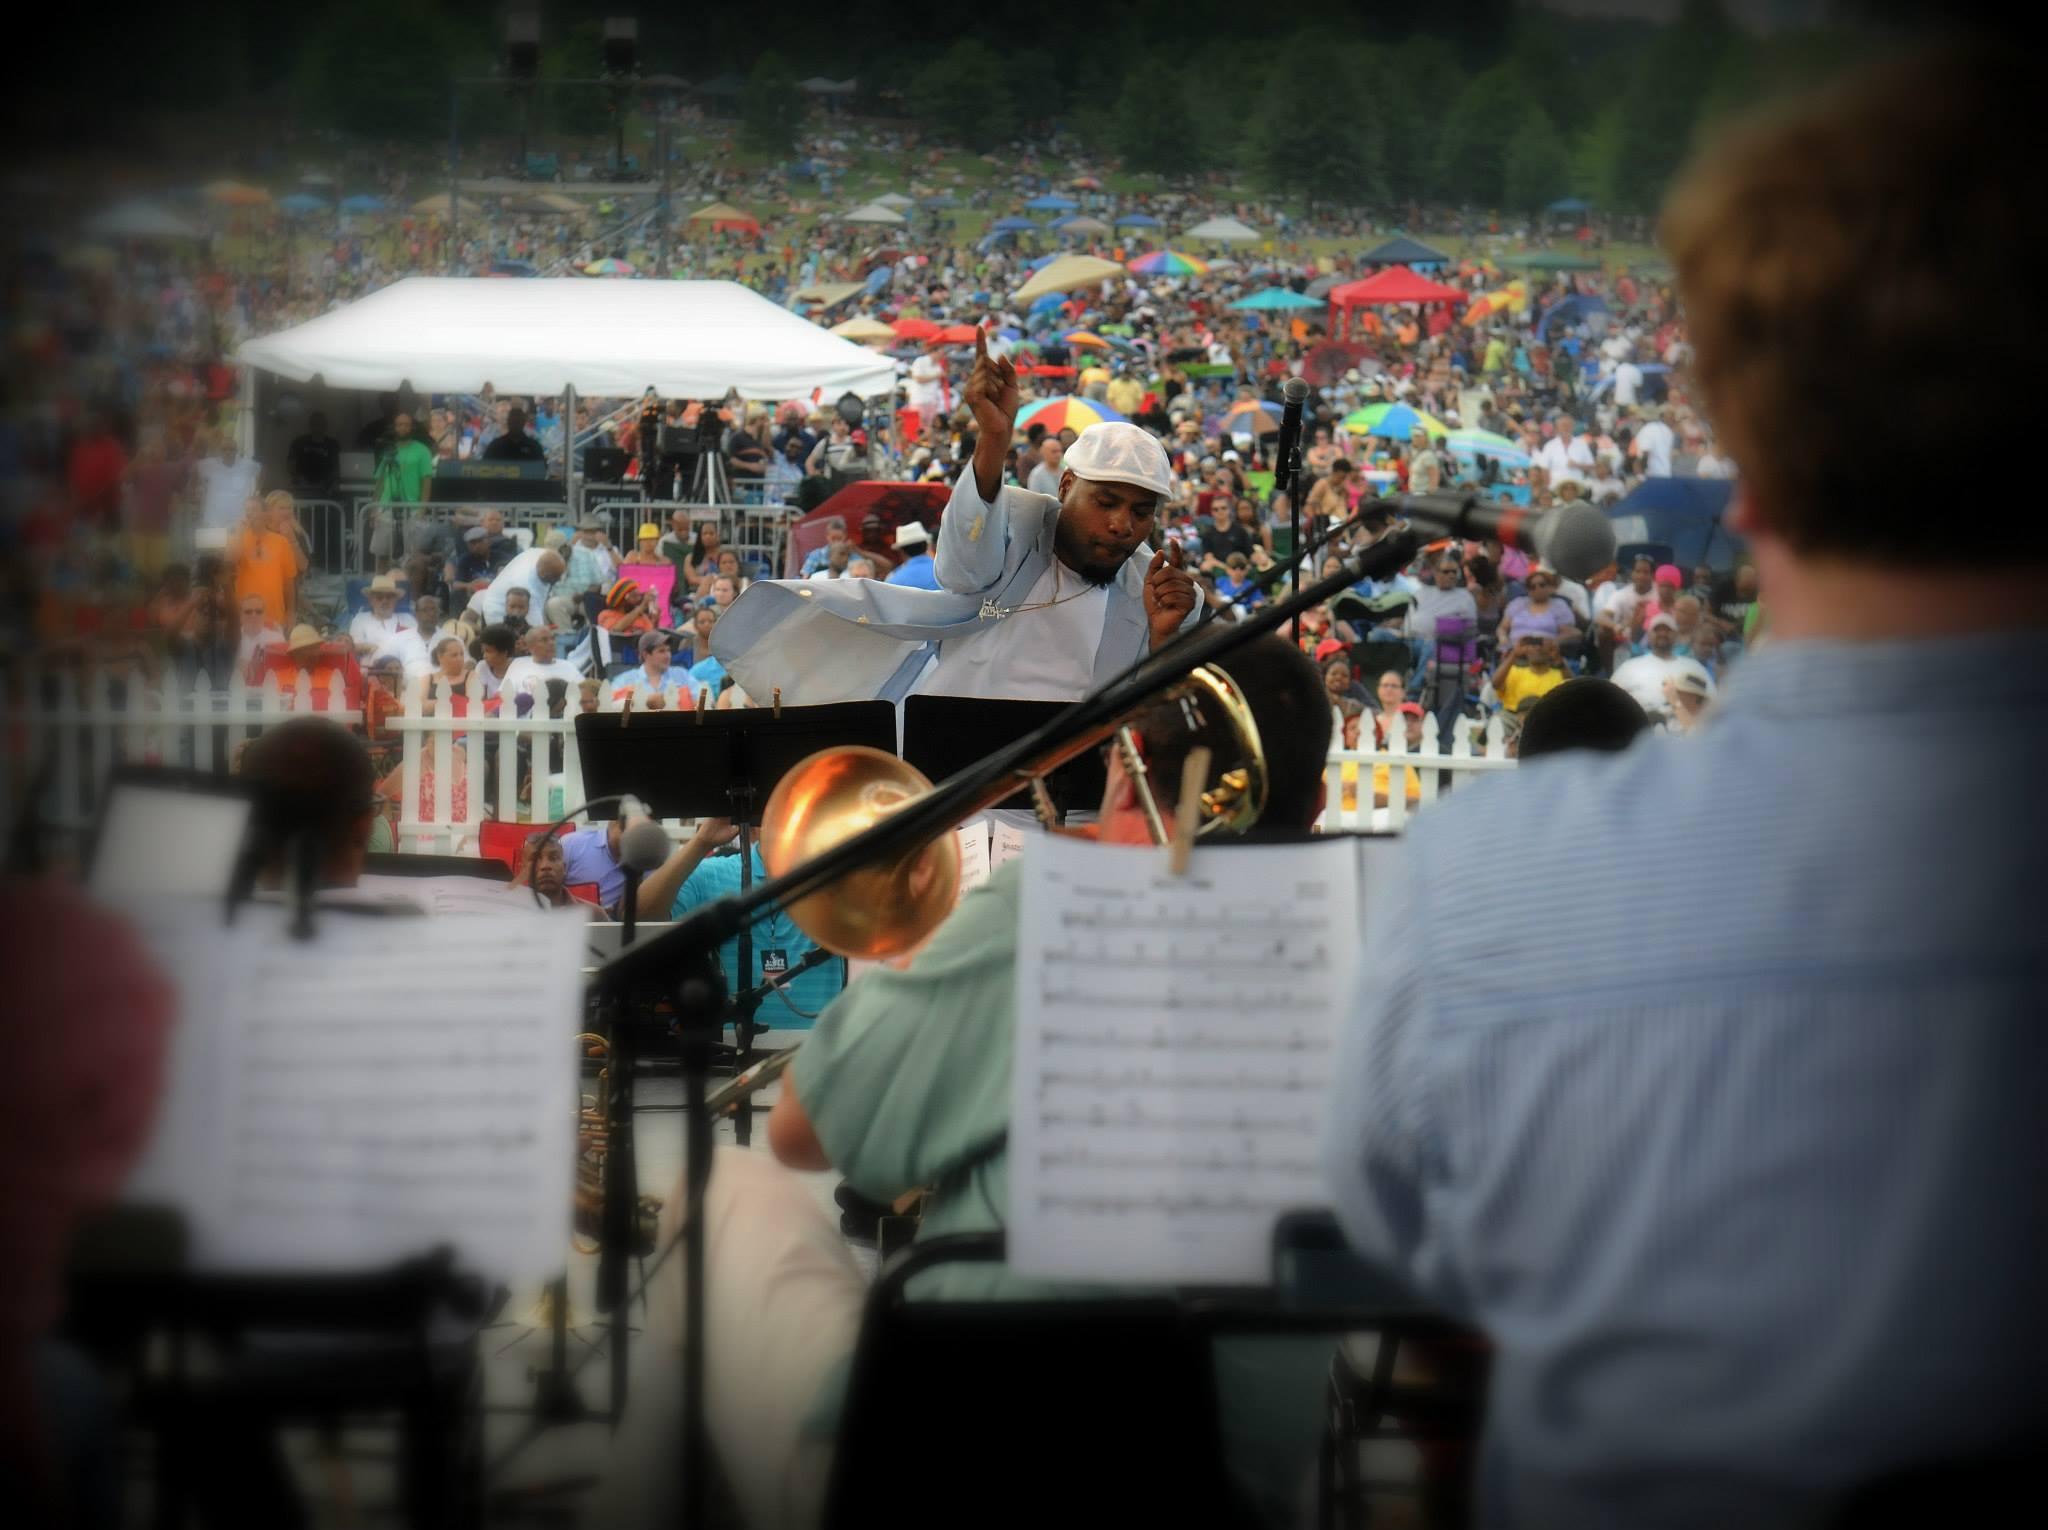 Russell Gunn Instructing the Band at the Atlanta Jazz Festivall